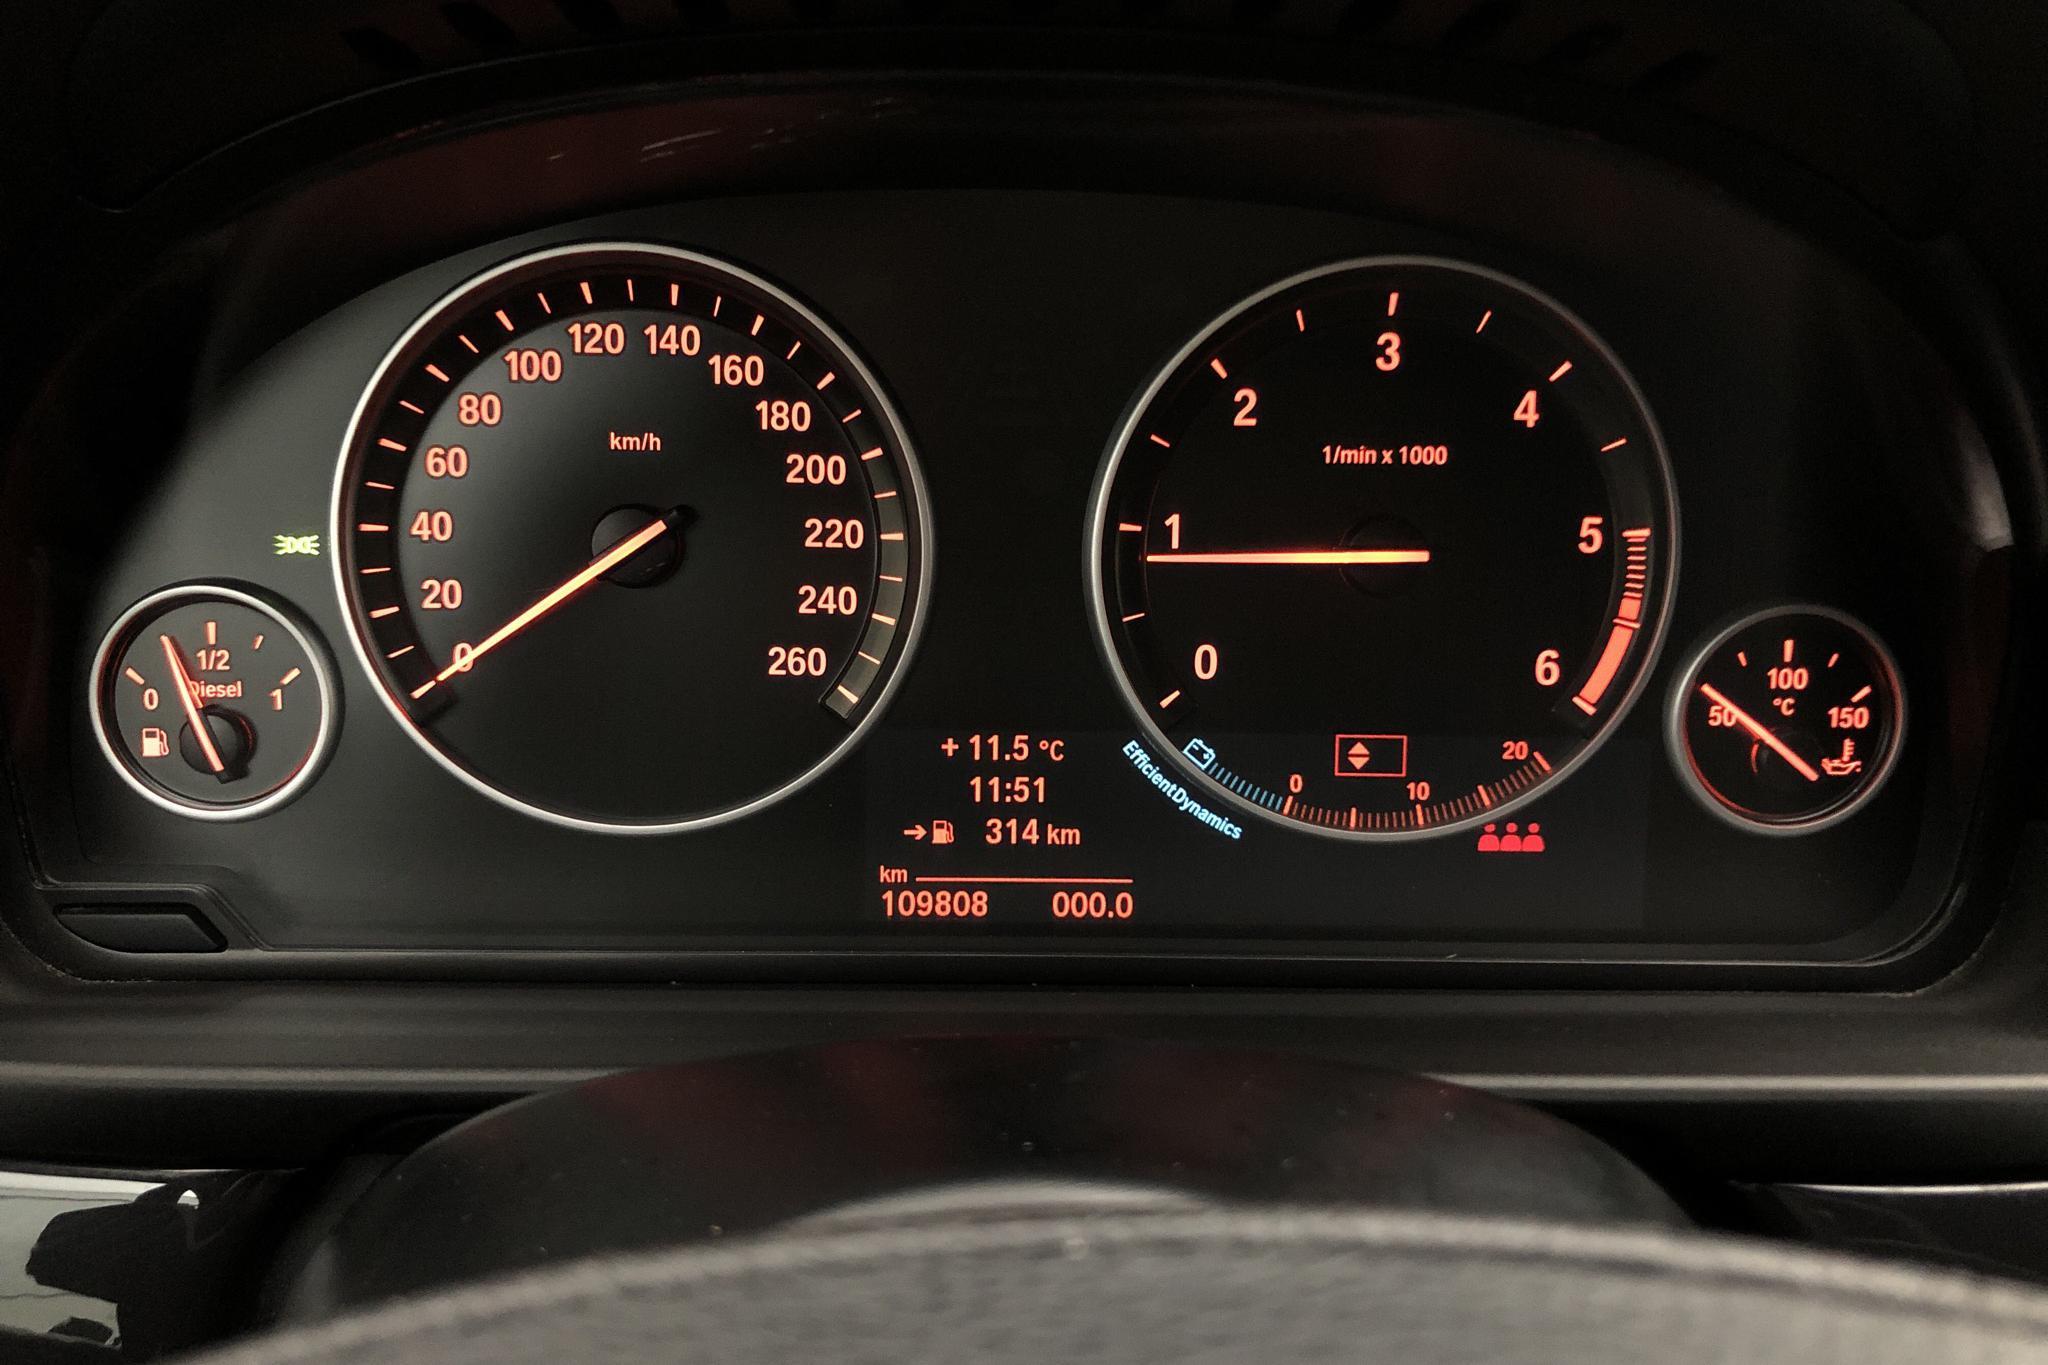 BMW 520d Touring, F11 (184hk) - 11 100 mil - Manuell - svart - 2014